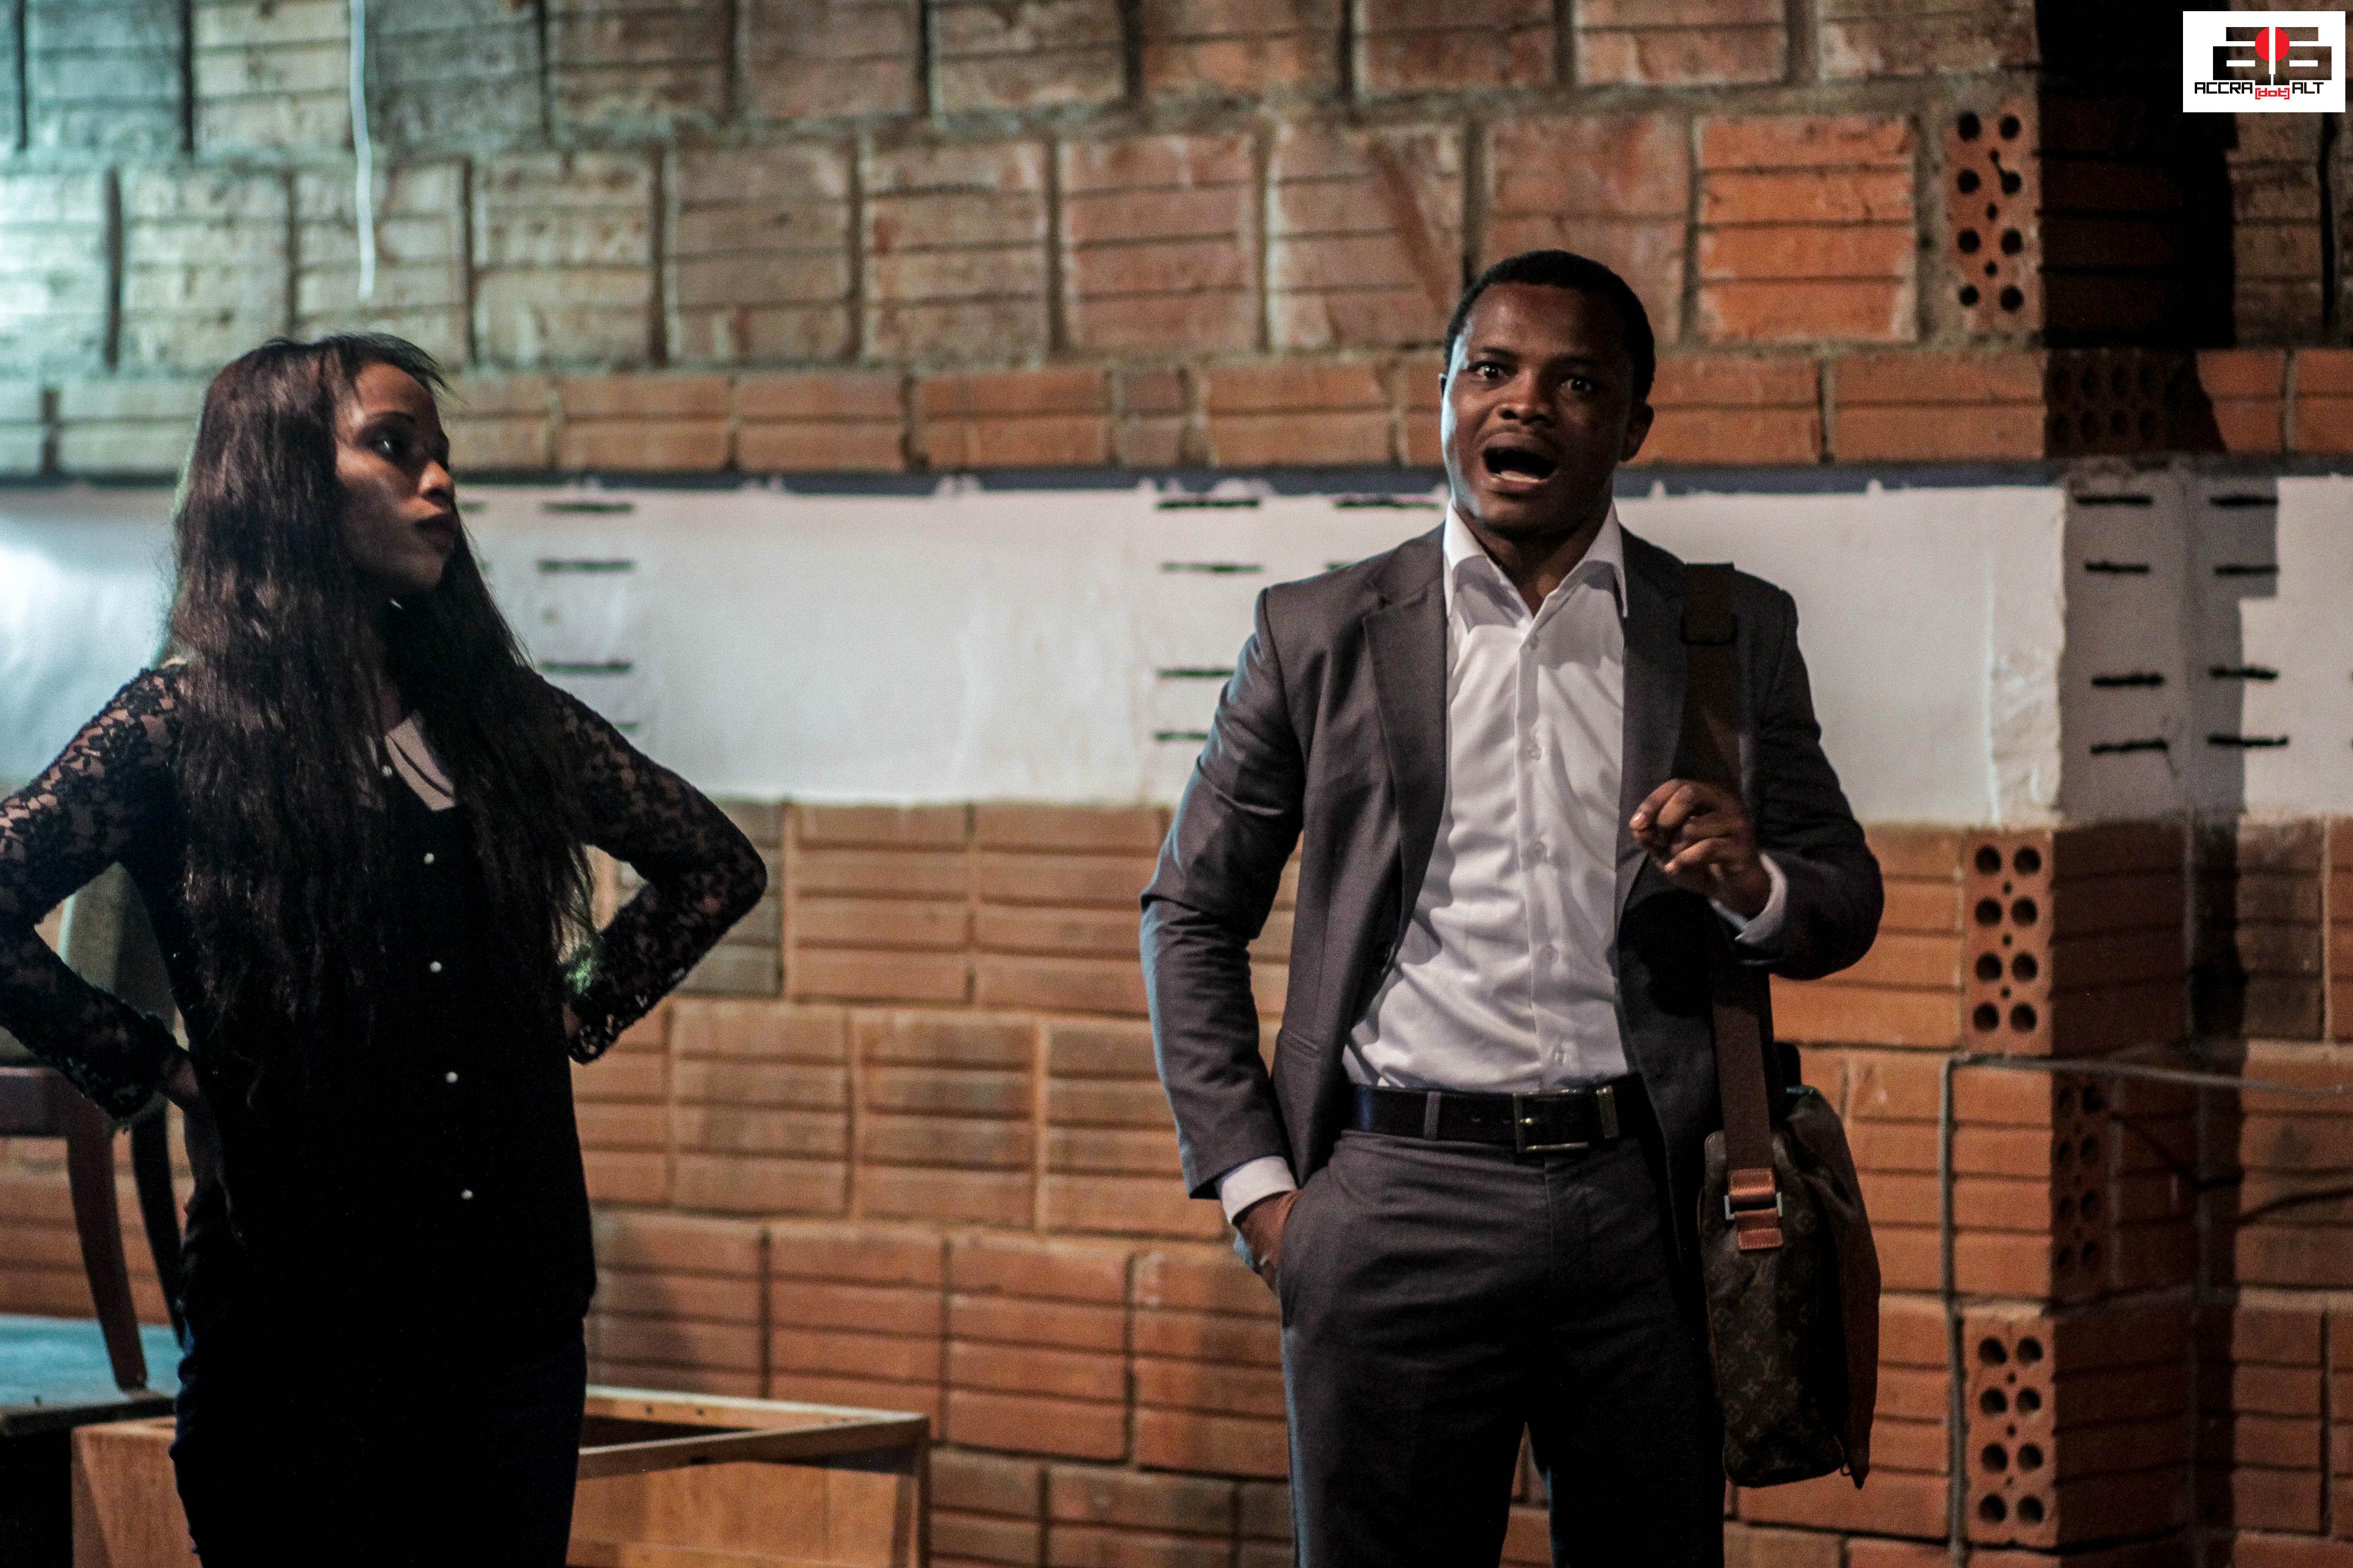 Arrival of Jane's Ex, Bernard (Jamal Shaibu)